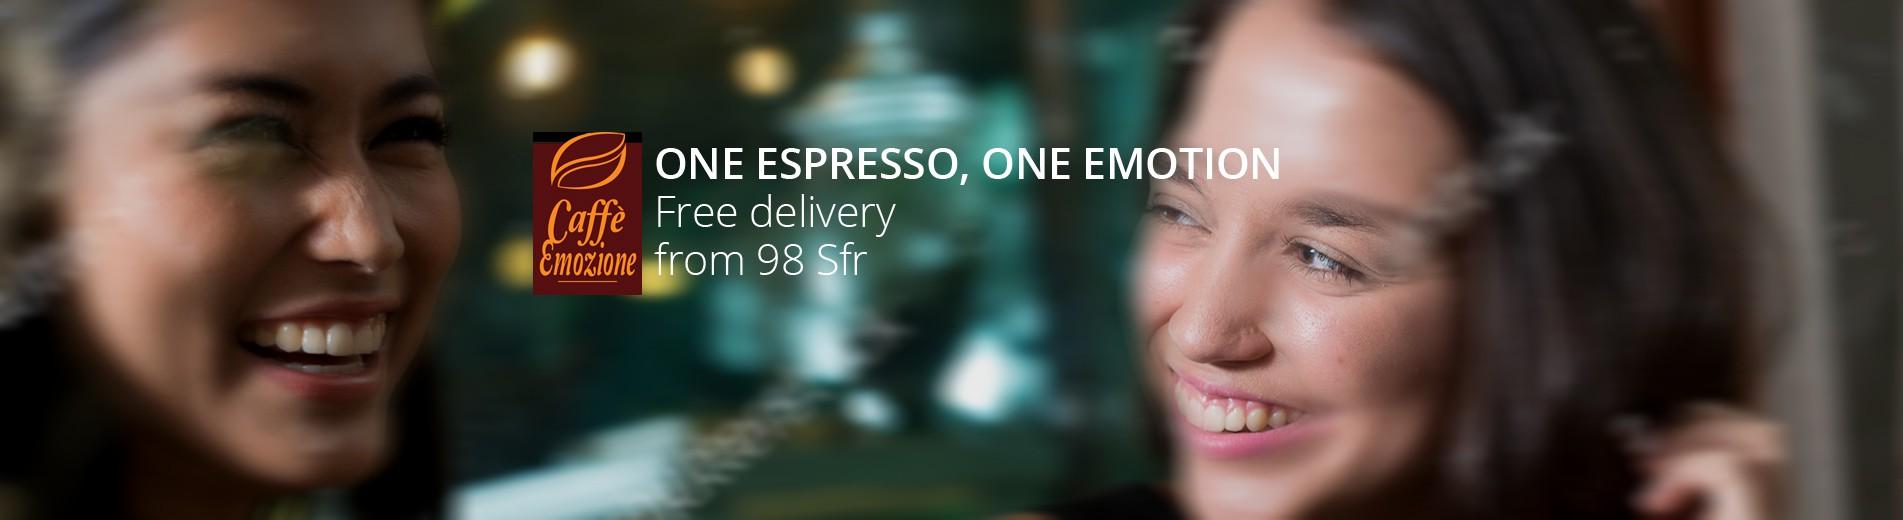 ONE ESPRESSO, ONE EMOTION